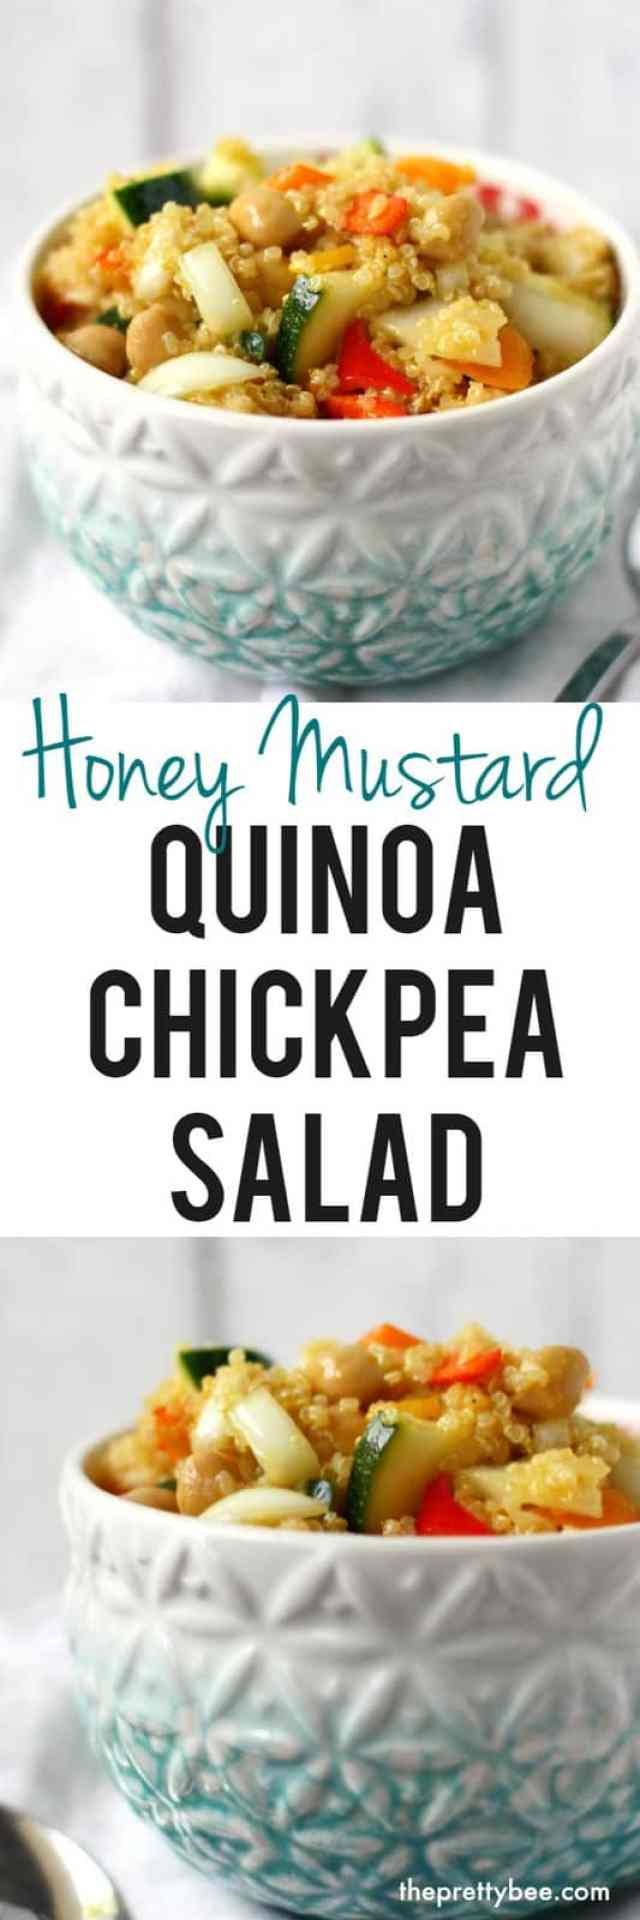 easy quinoa chickpea salad recipe